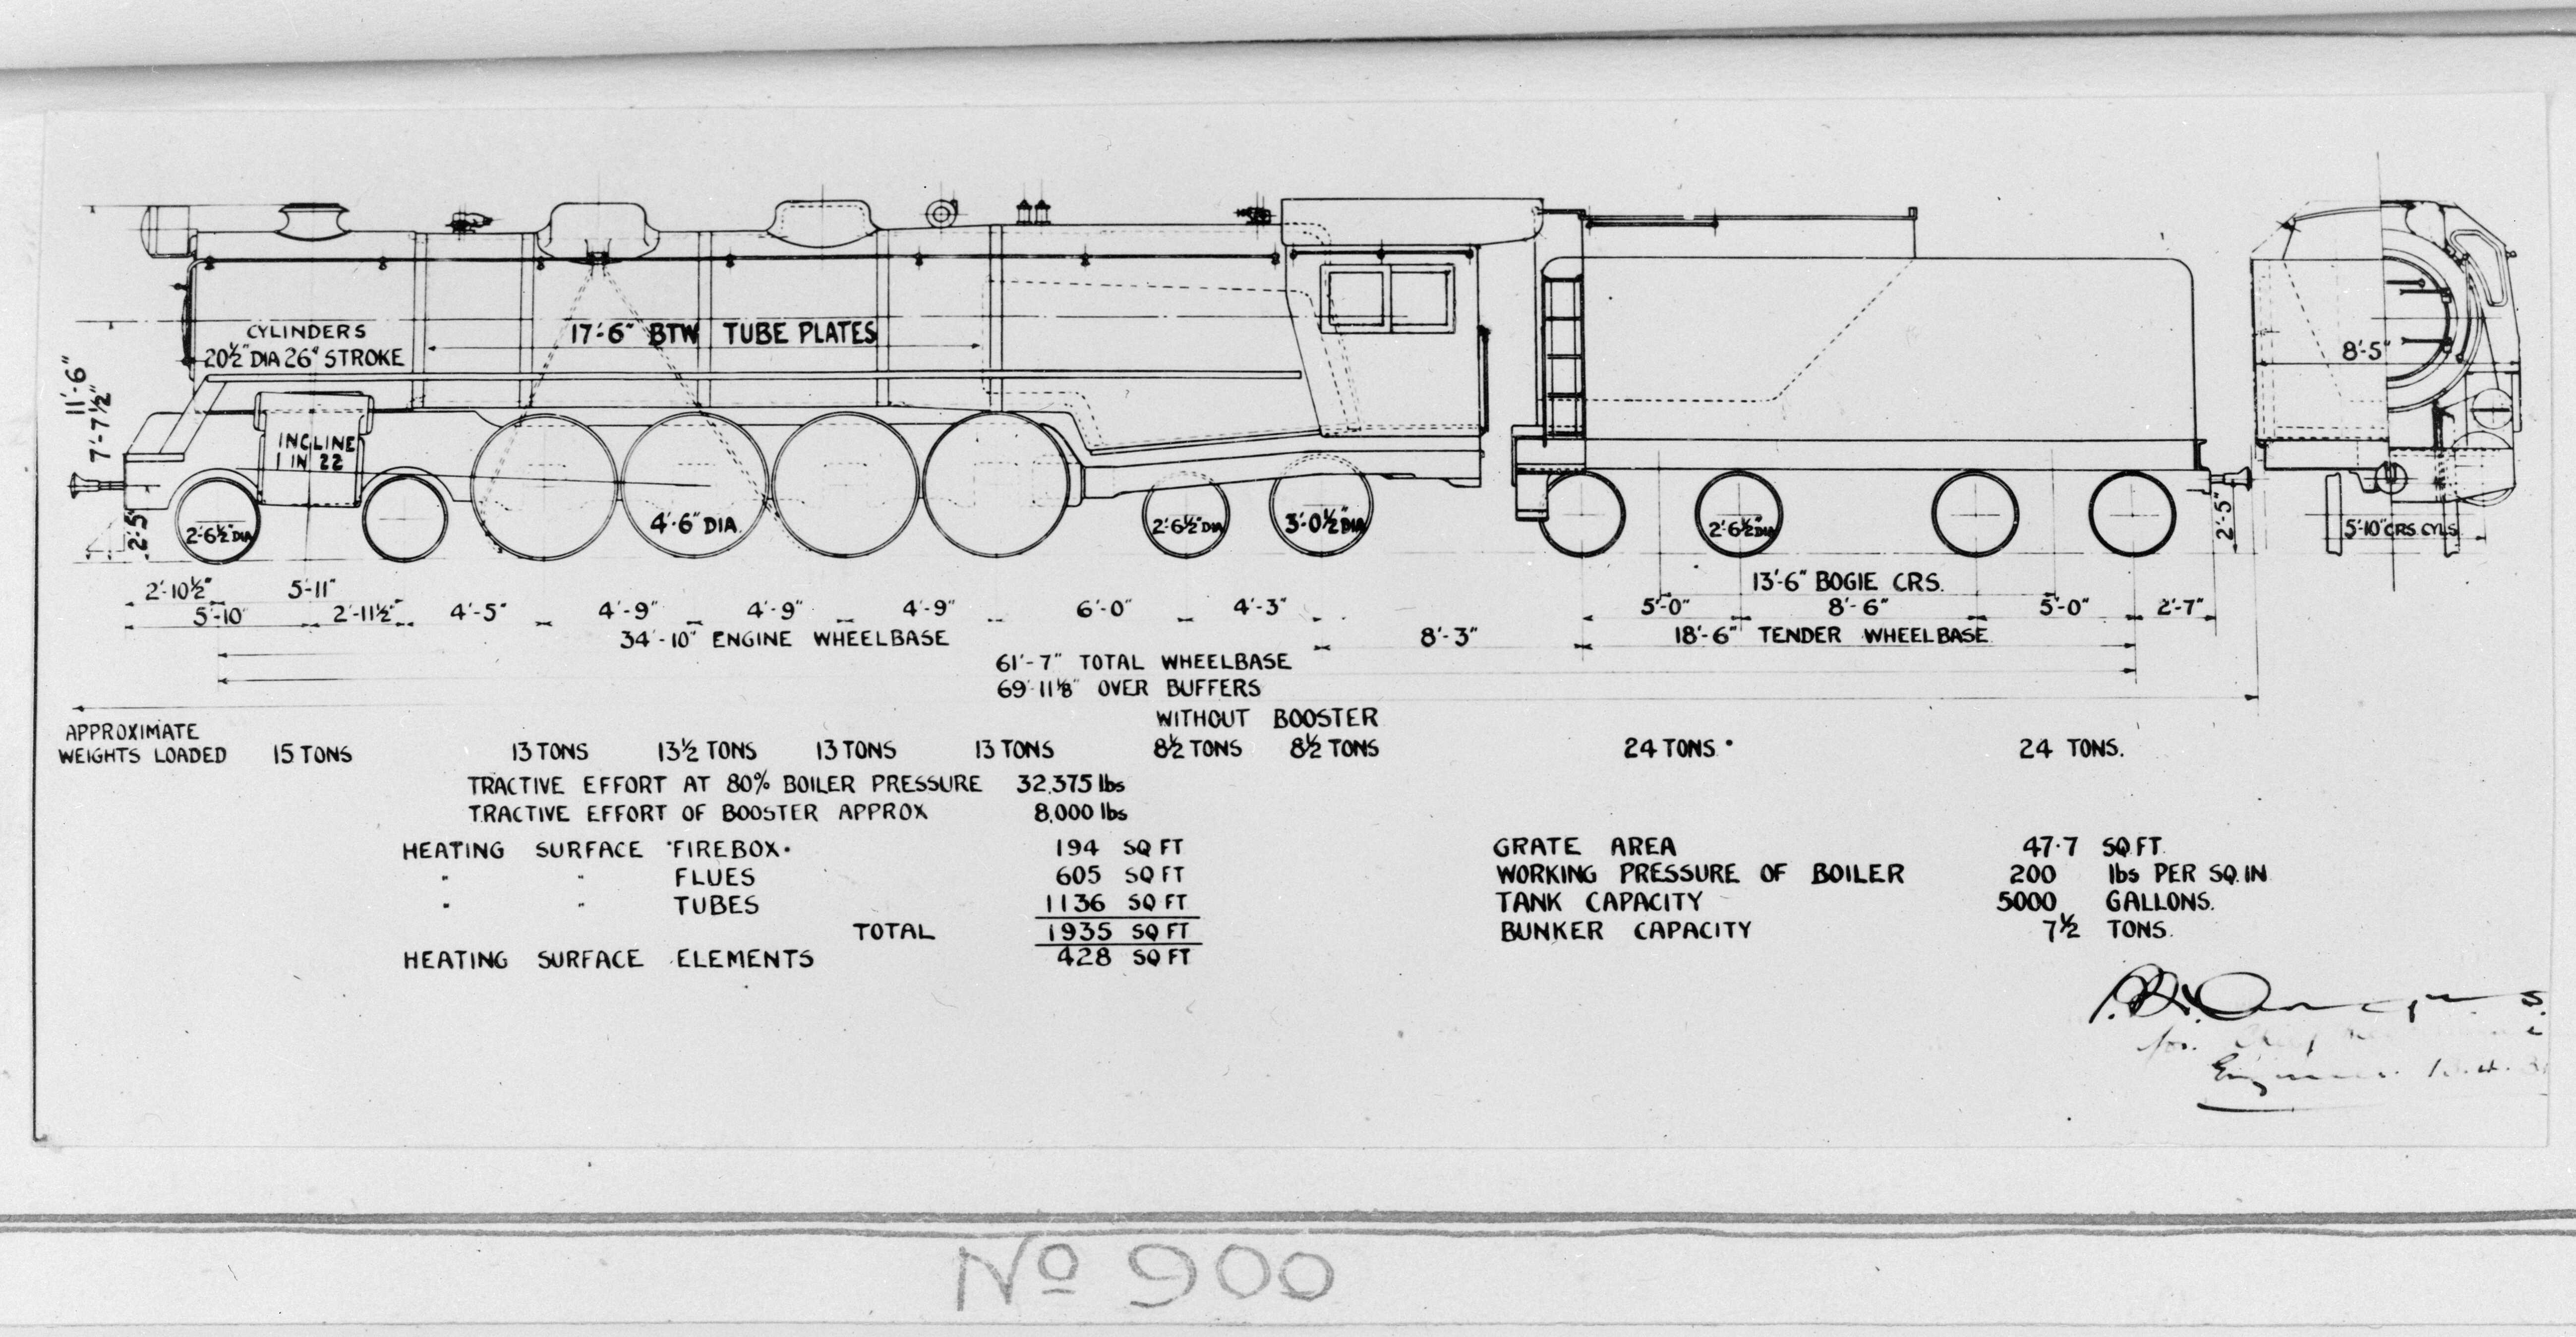 Fileblueprint plan for k class steam locomotive new zealand fileblueprint plan for k class steam locomotive new zealand railways no 900 malvernweather Images